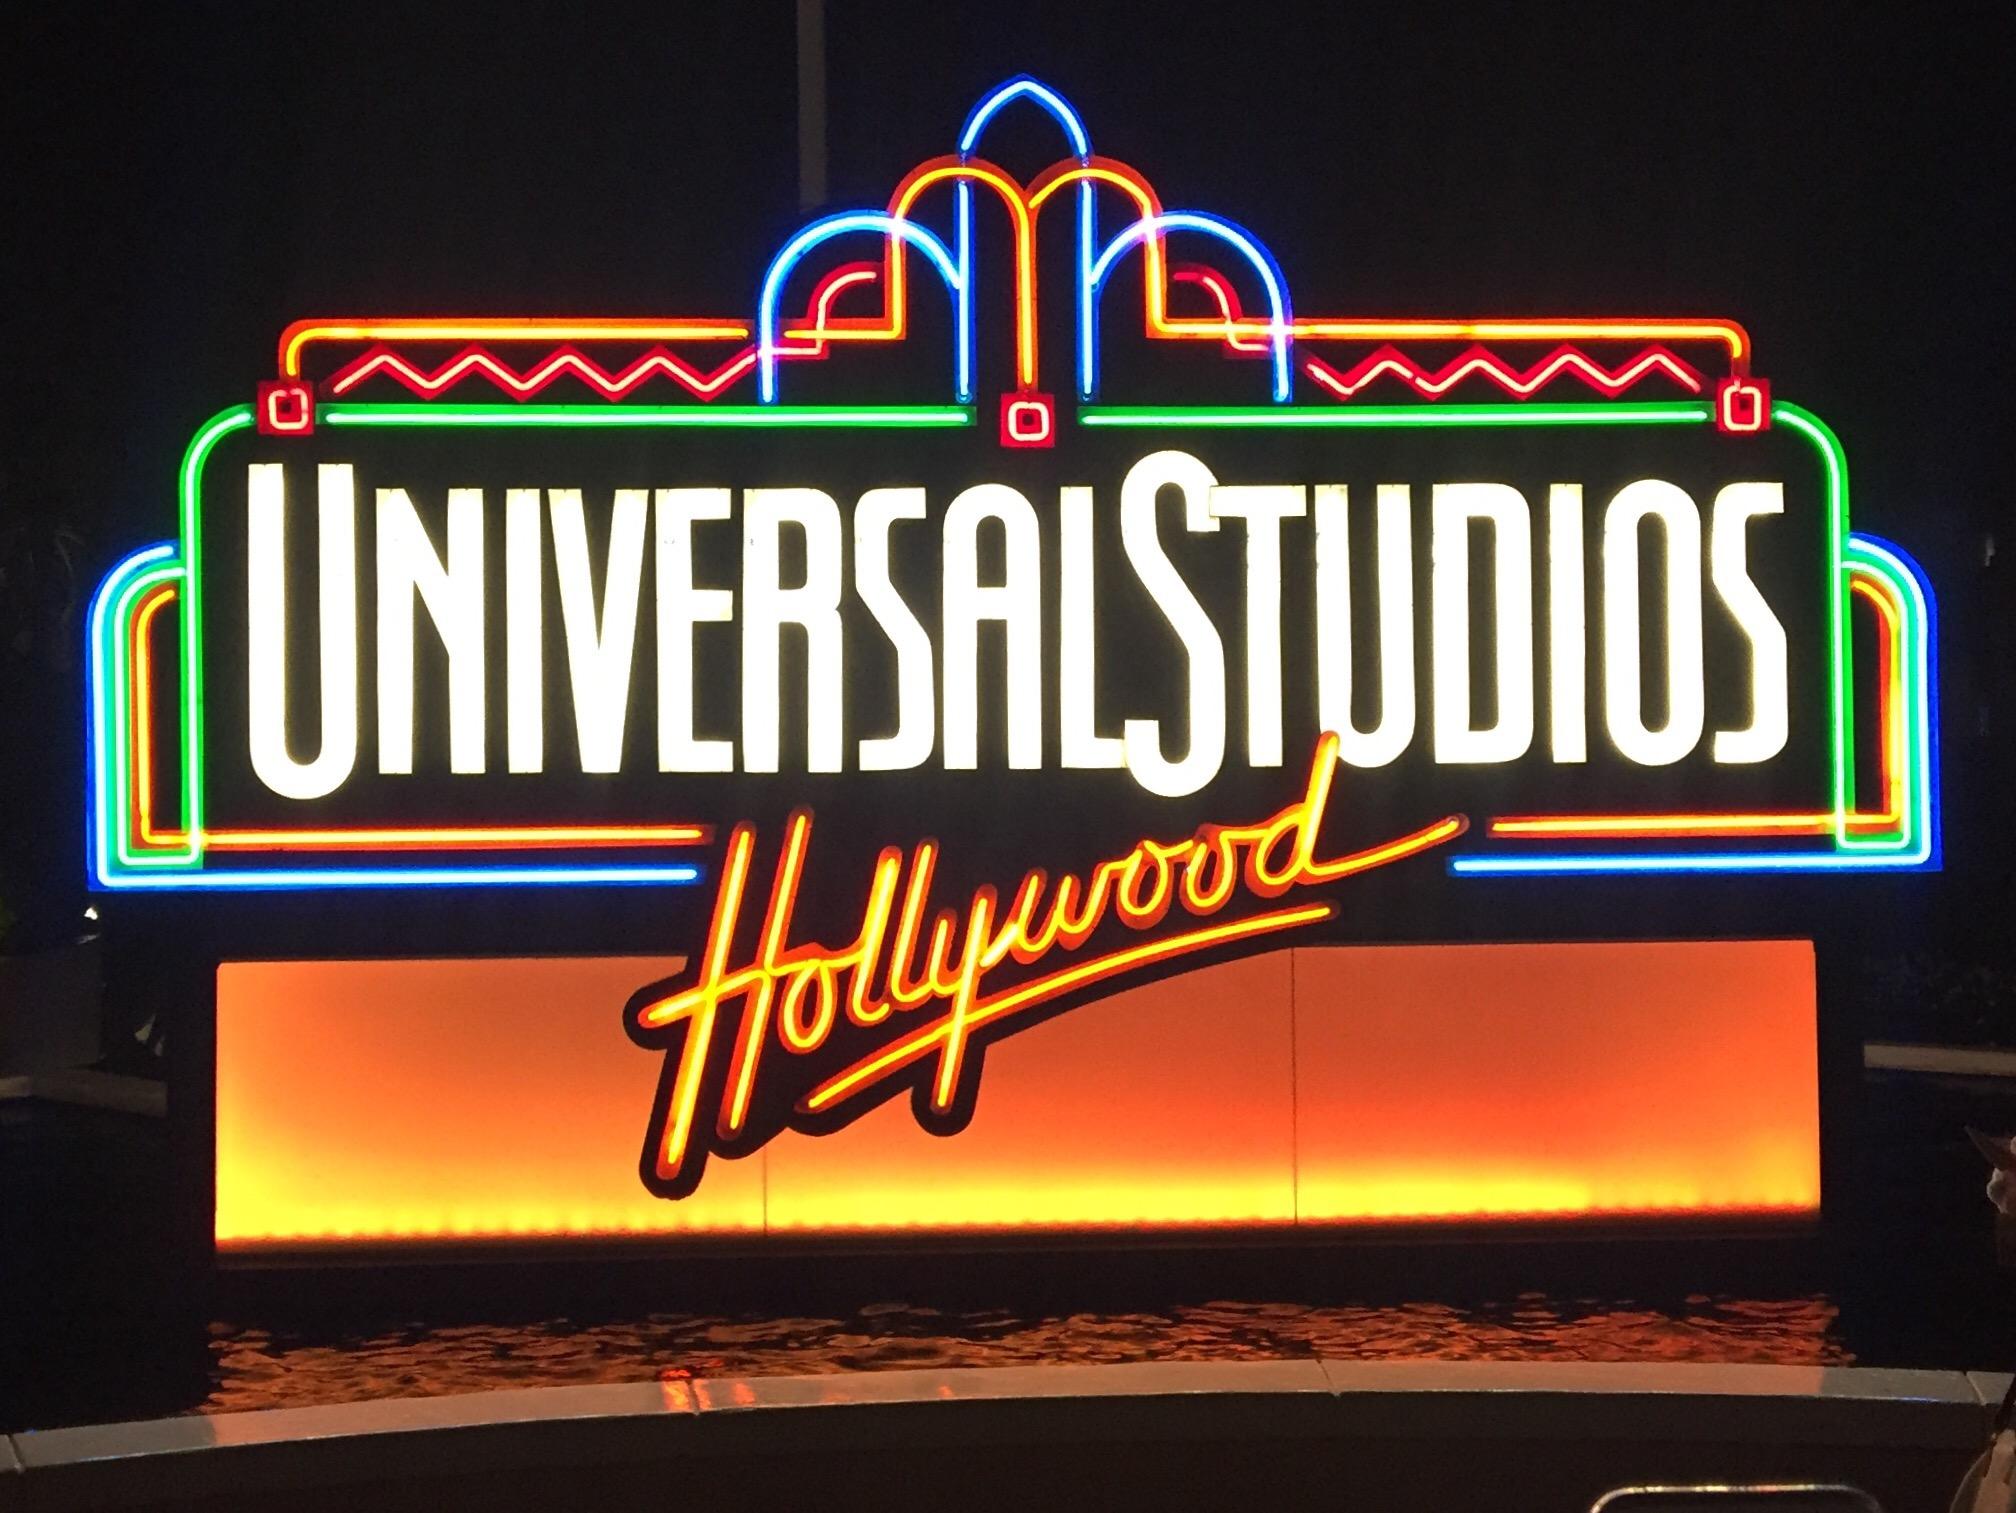 TheMouse sur YouTube: TheMouse au Farwest #3 Los Angeles Universal studios